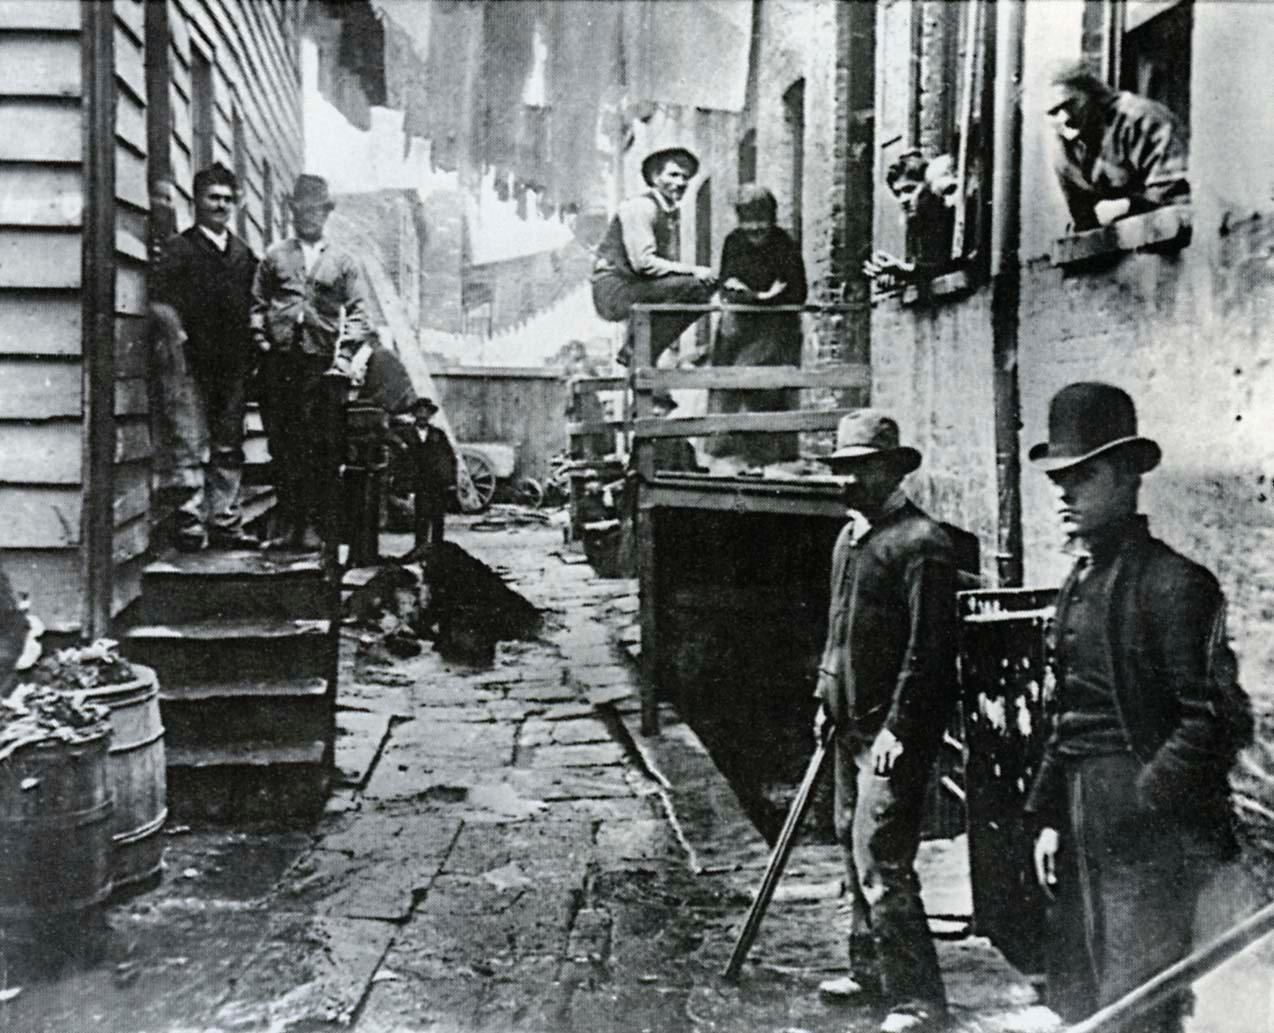 bandits_roost_1888_jacob_riis